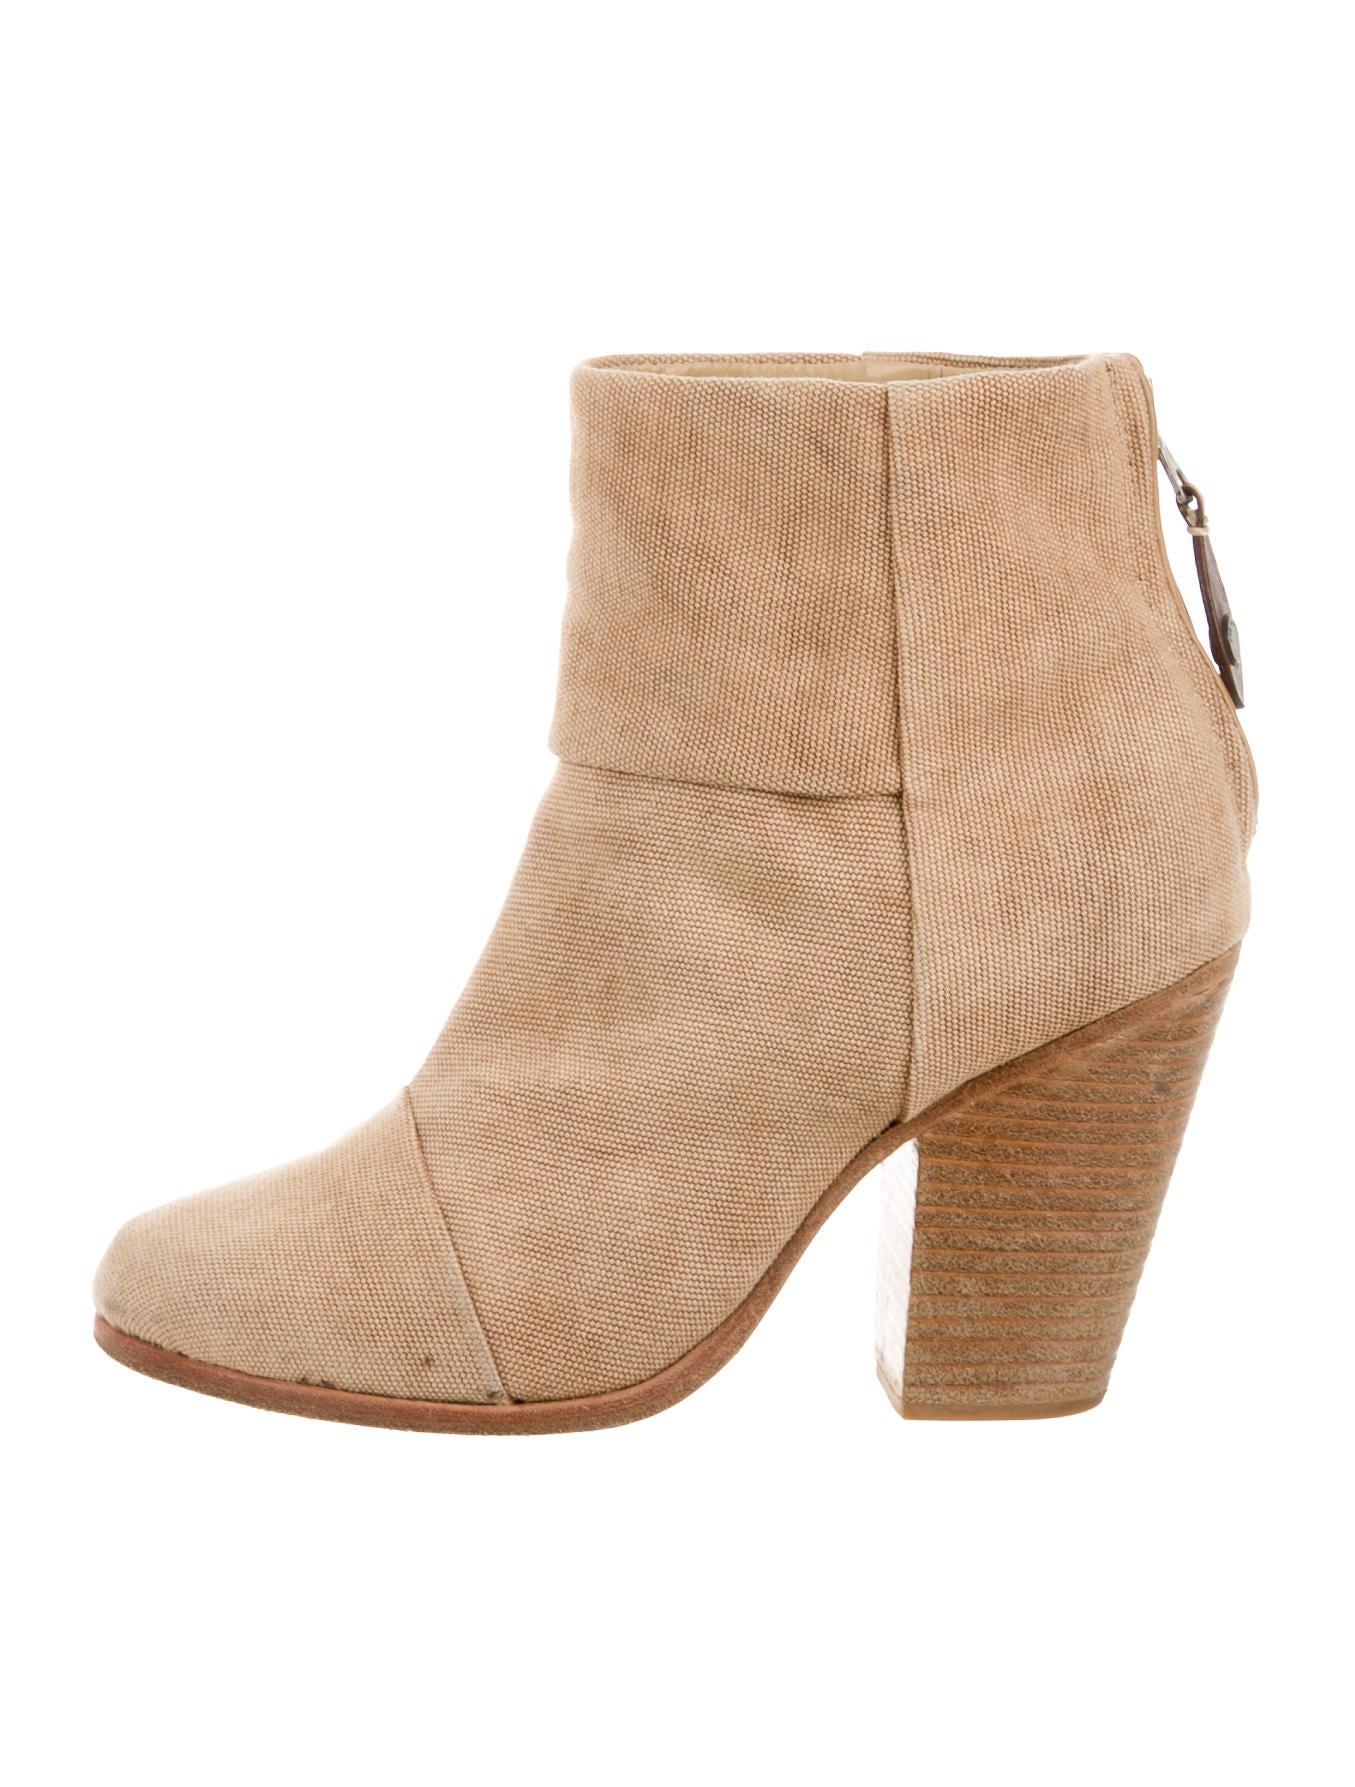 rag bone canvas newbury ankle boots shoes wragb48856